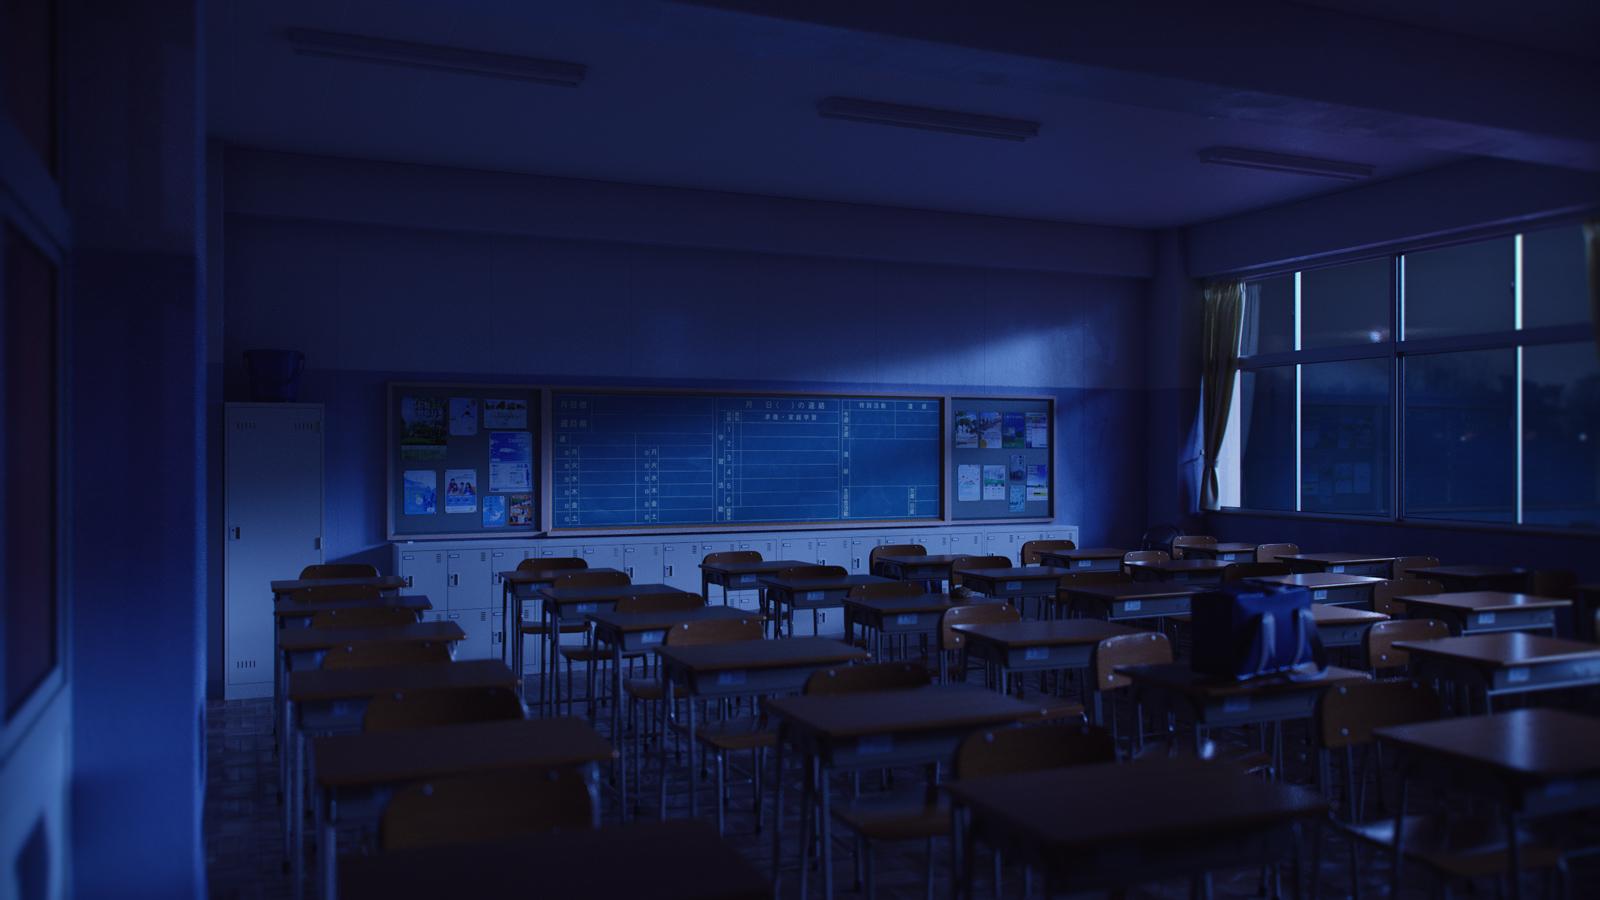 Classroom Night By ICephei On DeviantArt